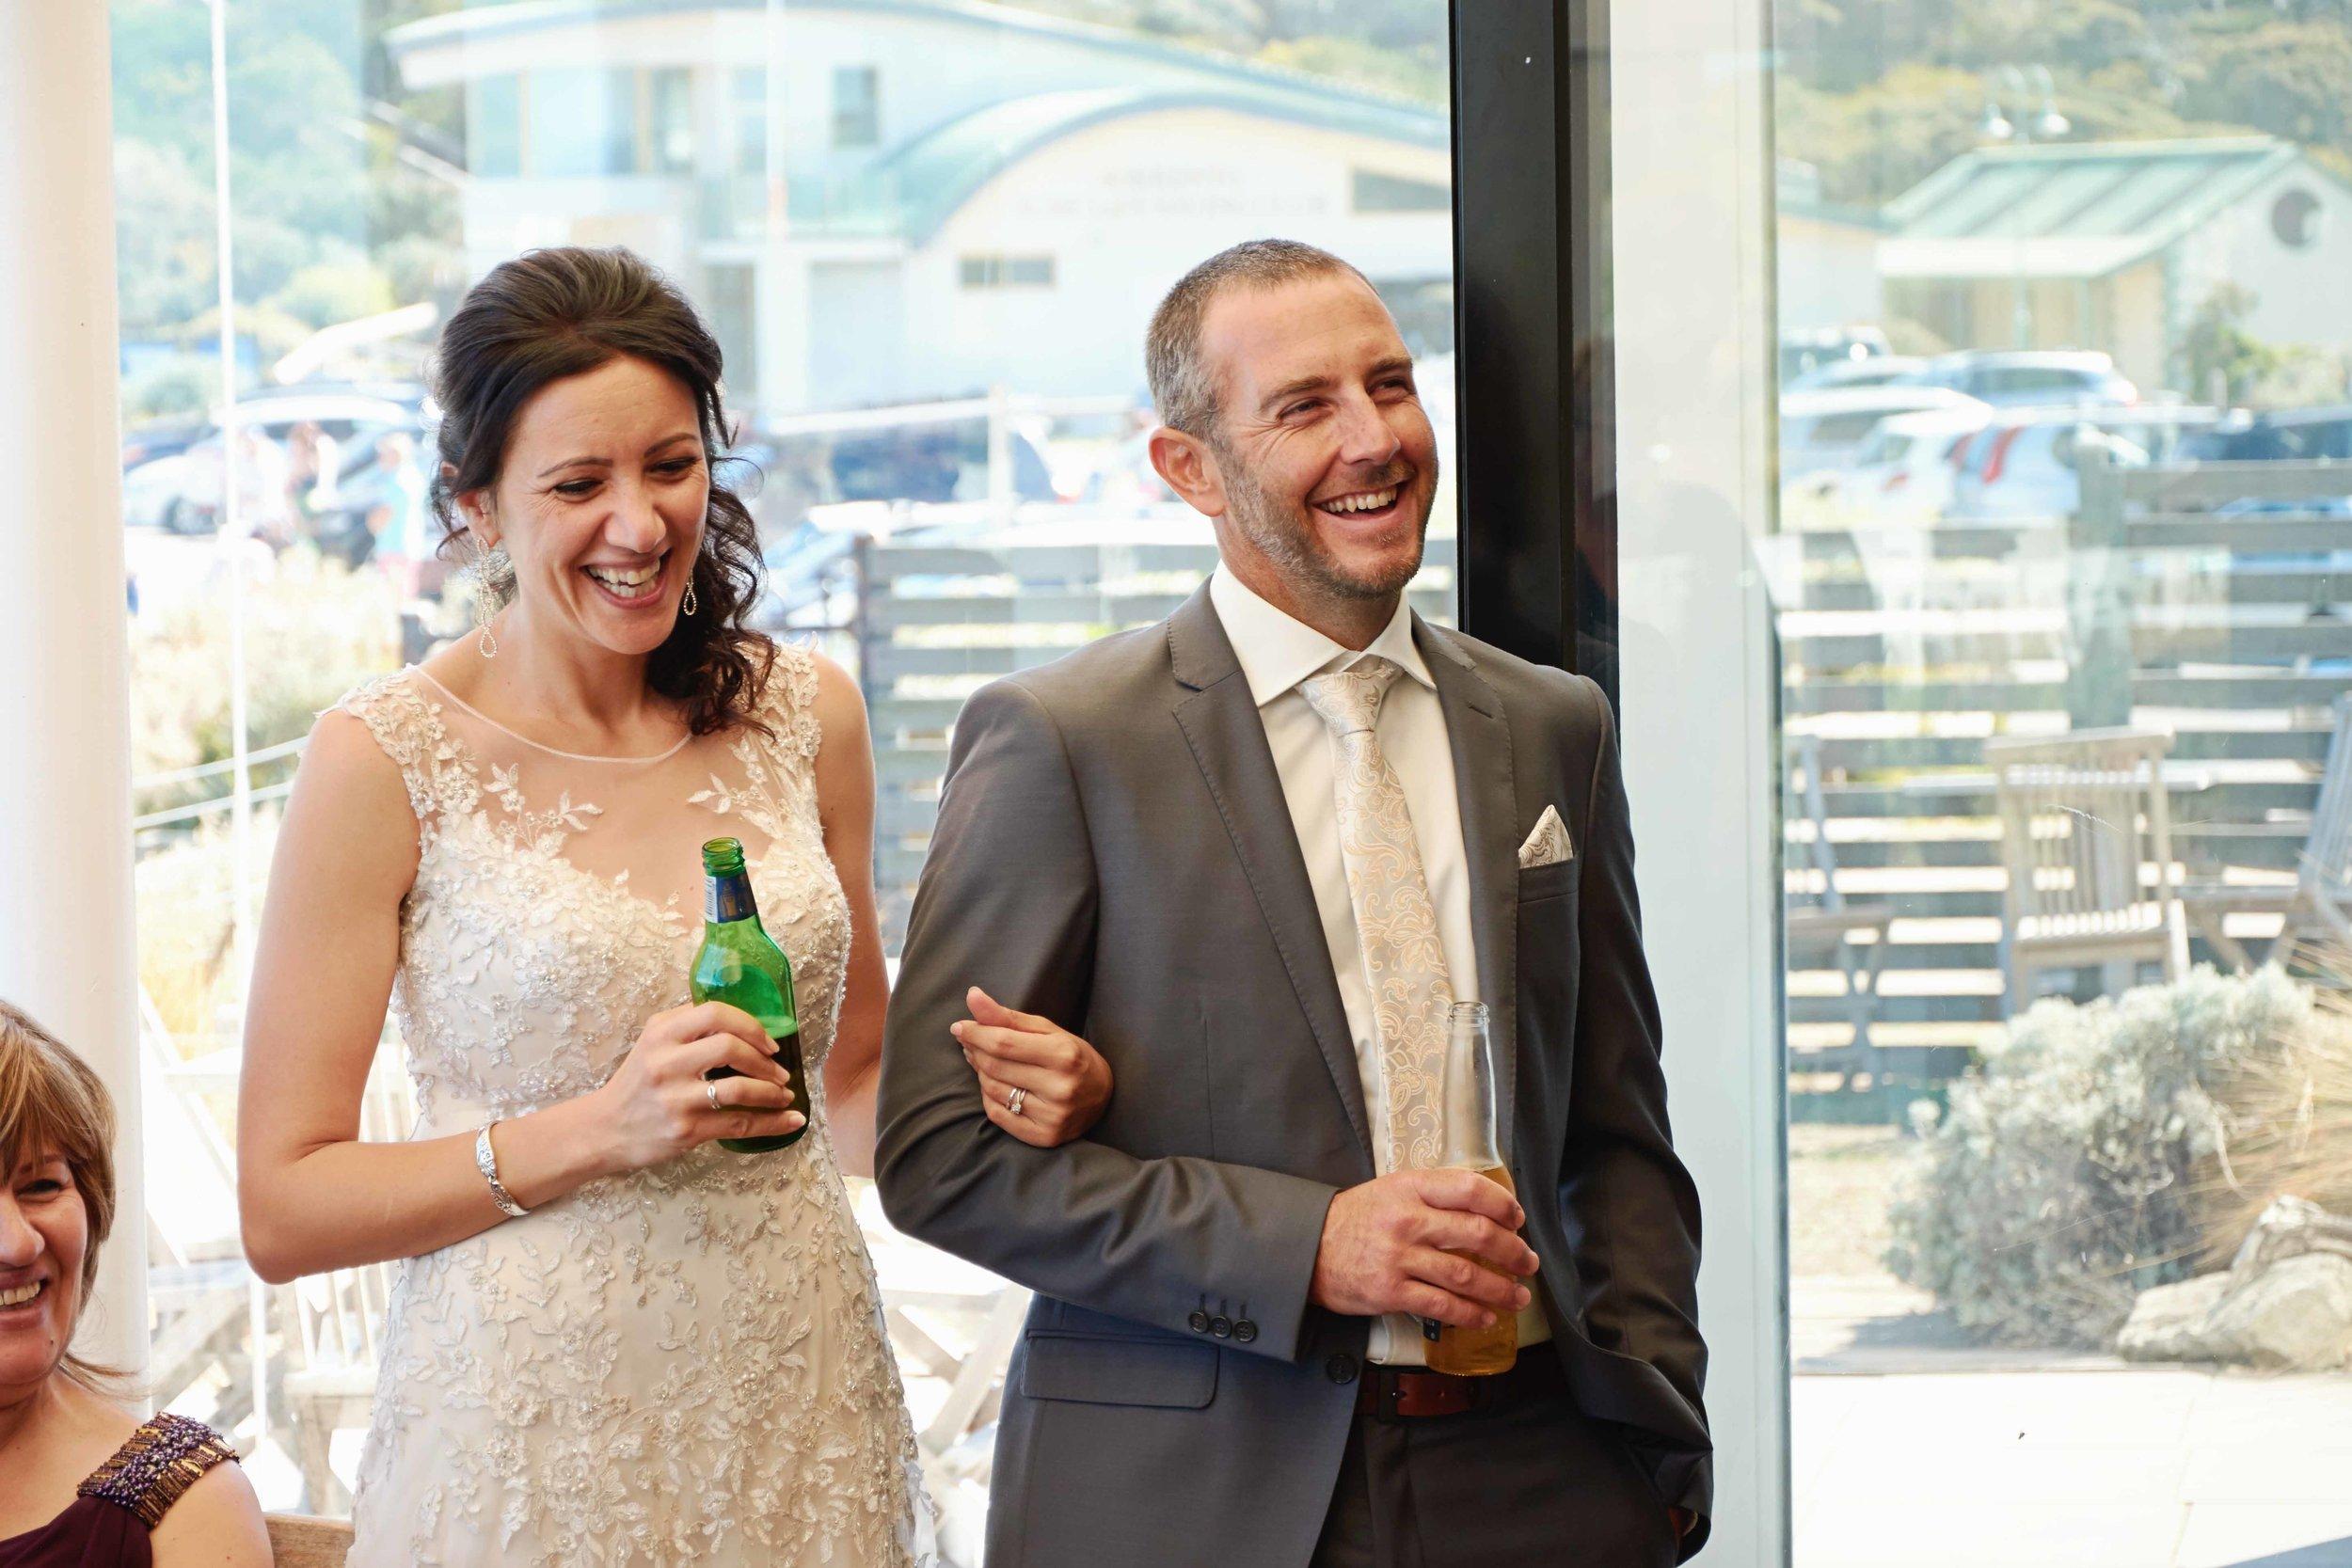 sorrento-wedding-photography-all-smiles-marissa-jade-photography-88.jpg